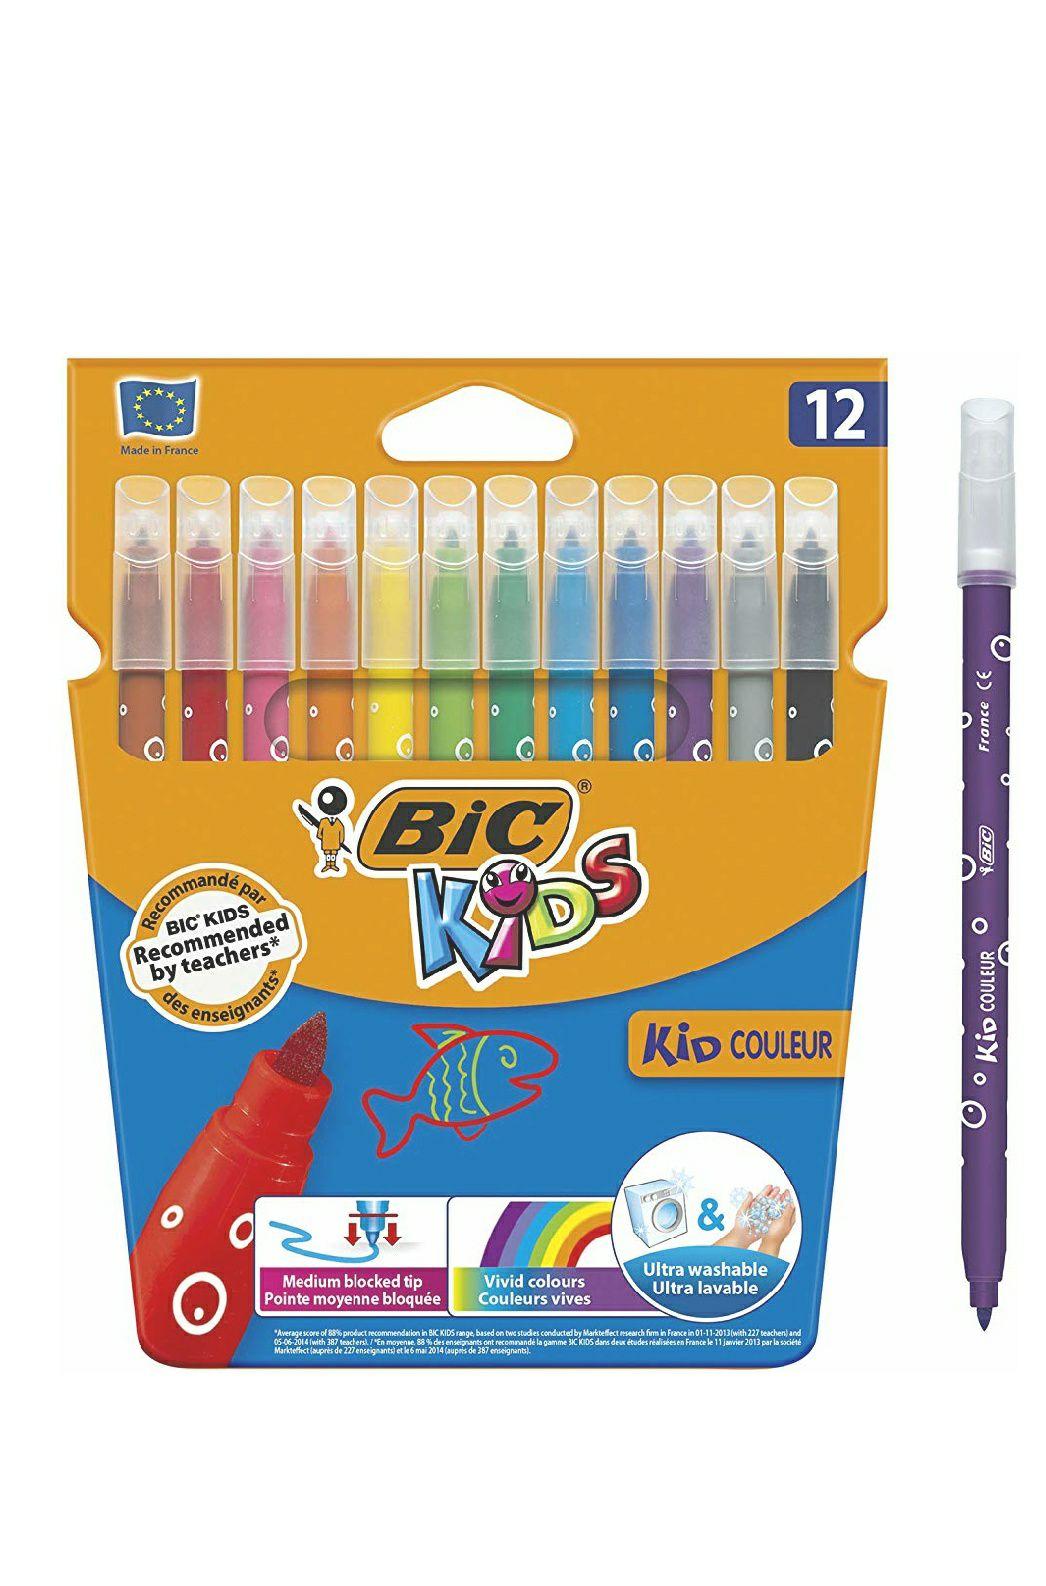 BIC Kids Couleur Felt Tip Colouring Pens - Assorted Colours - Cardboard Wallet of 12 - £1.50 @ Amazon Prime (+£4.49 non-Prime)